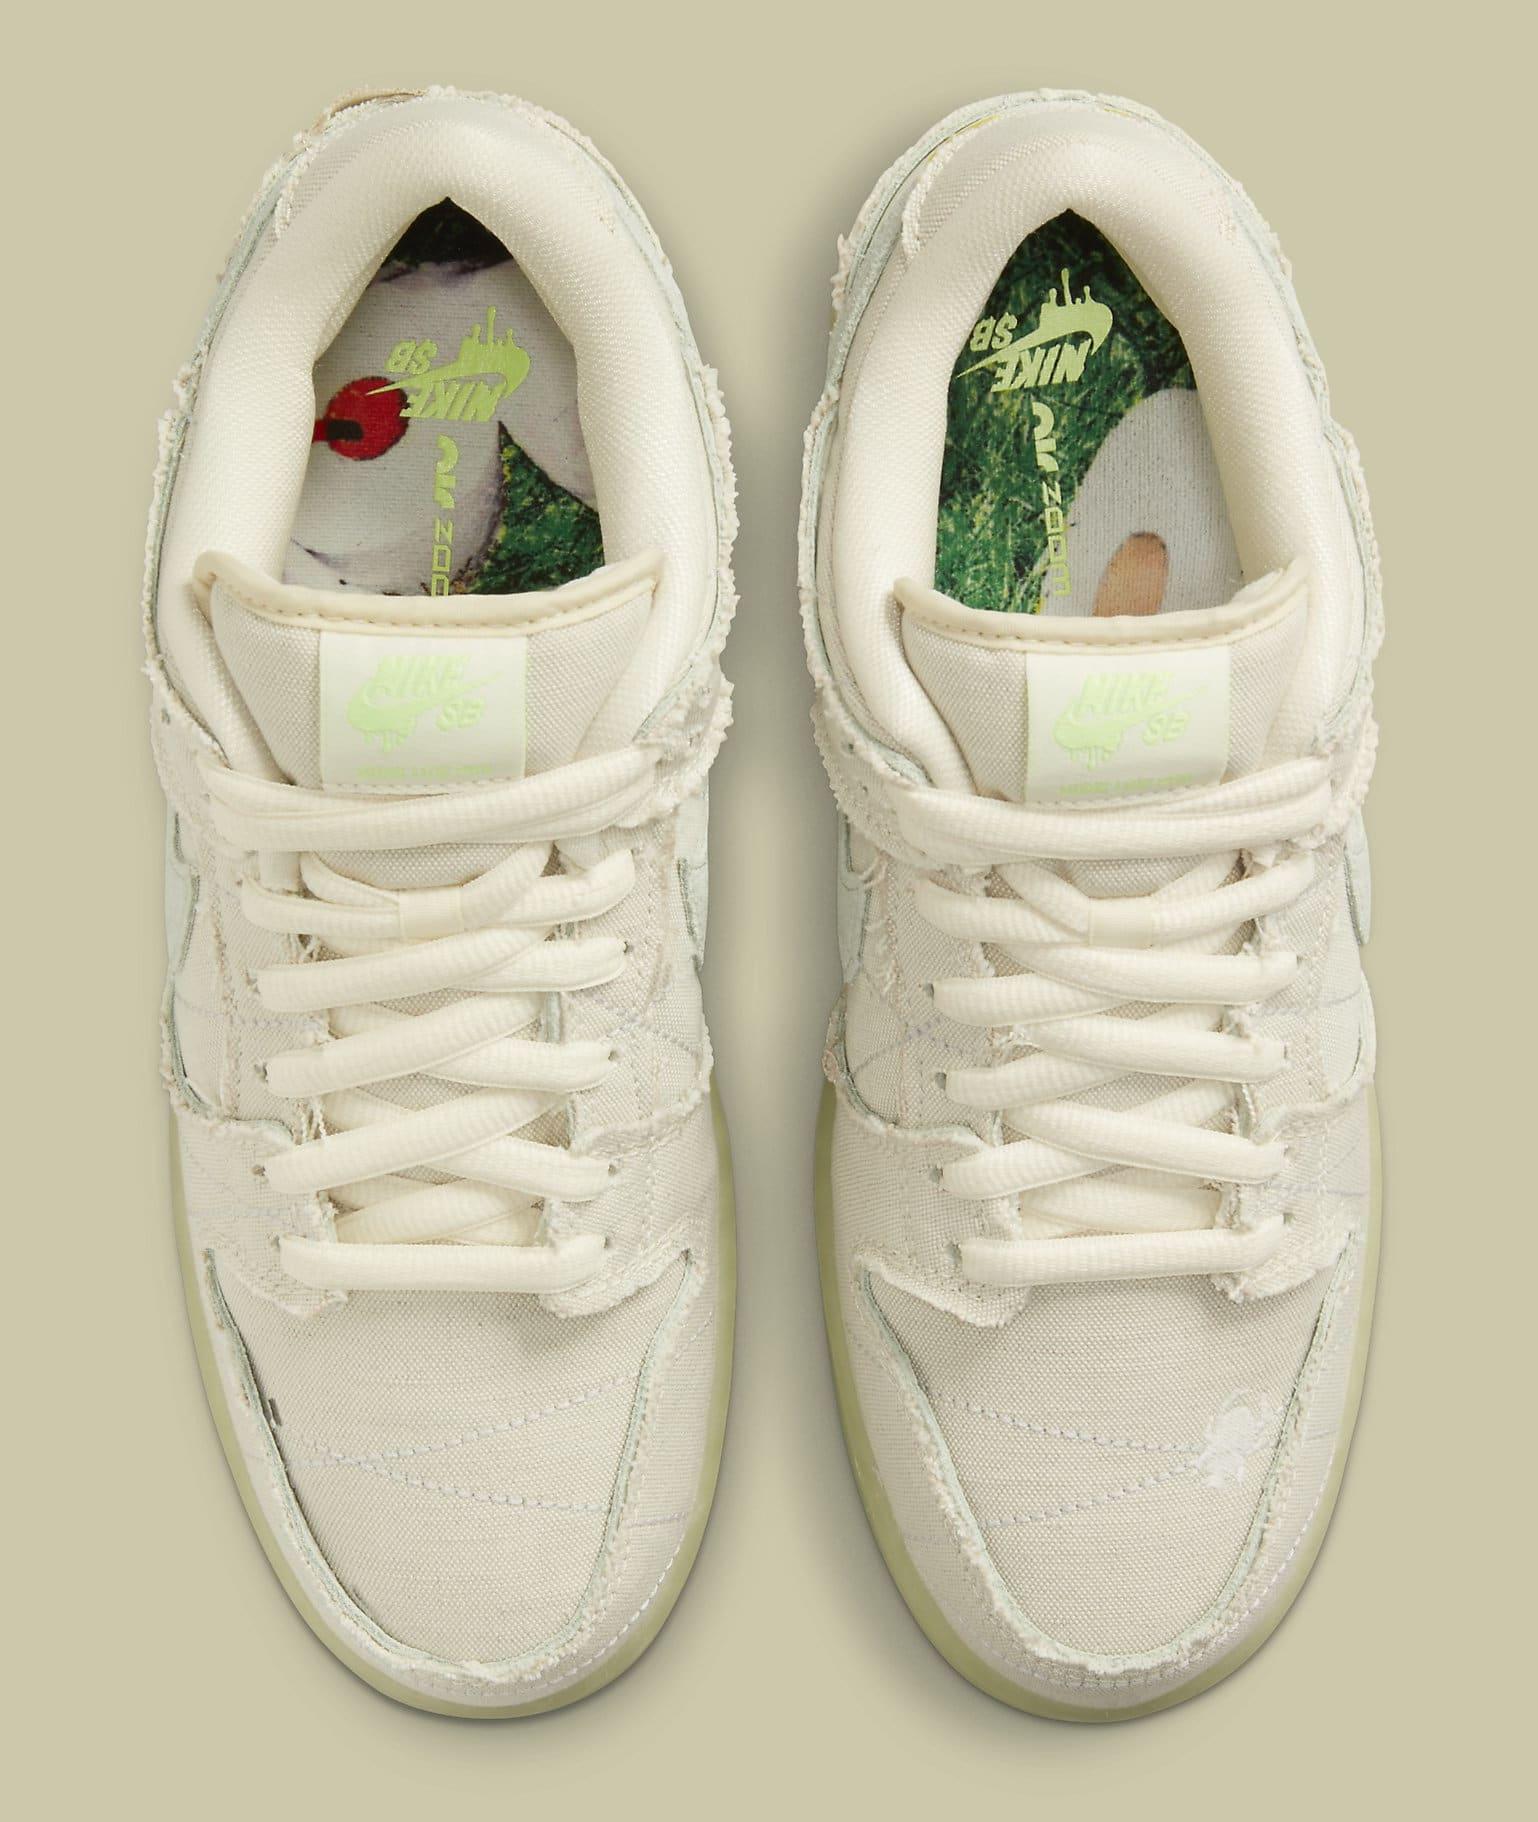 Nike SB Dunk Low 'Mummy' DM0774-111 Top